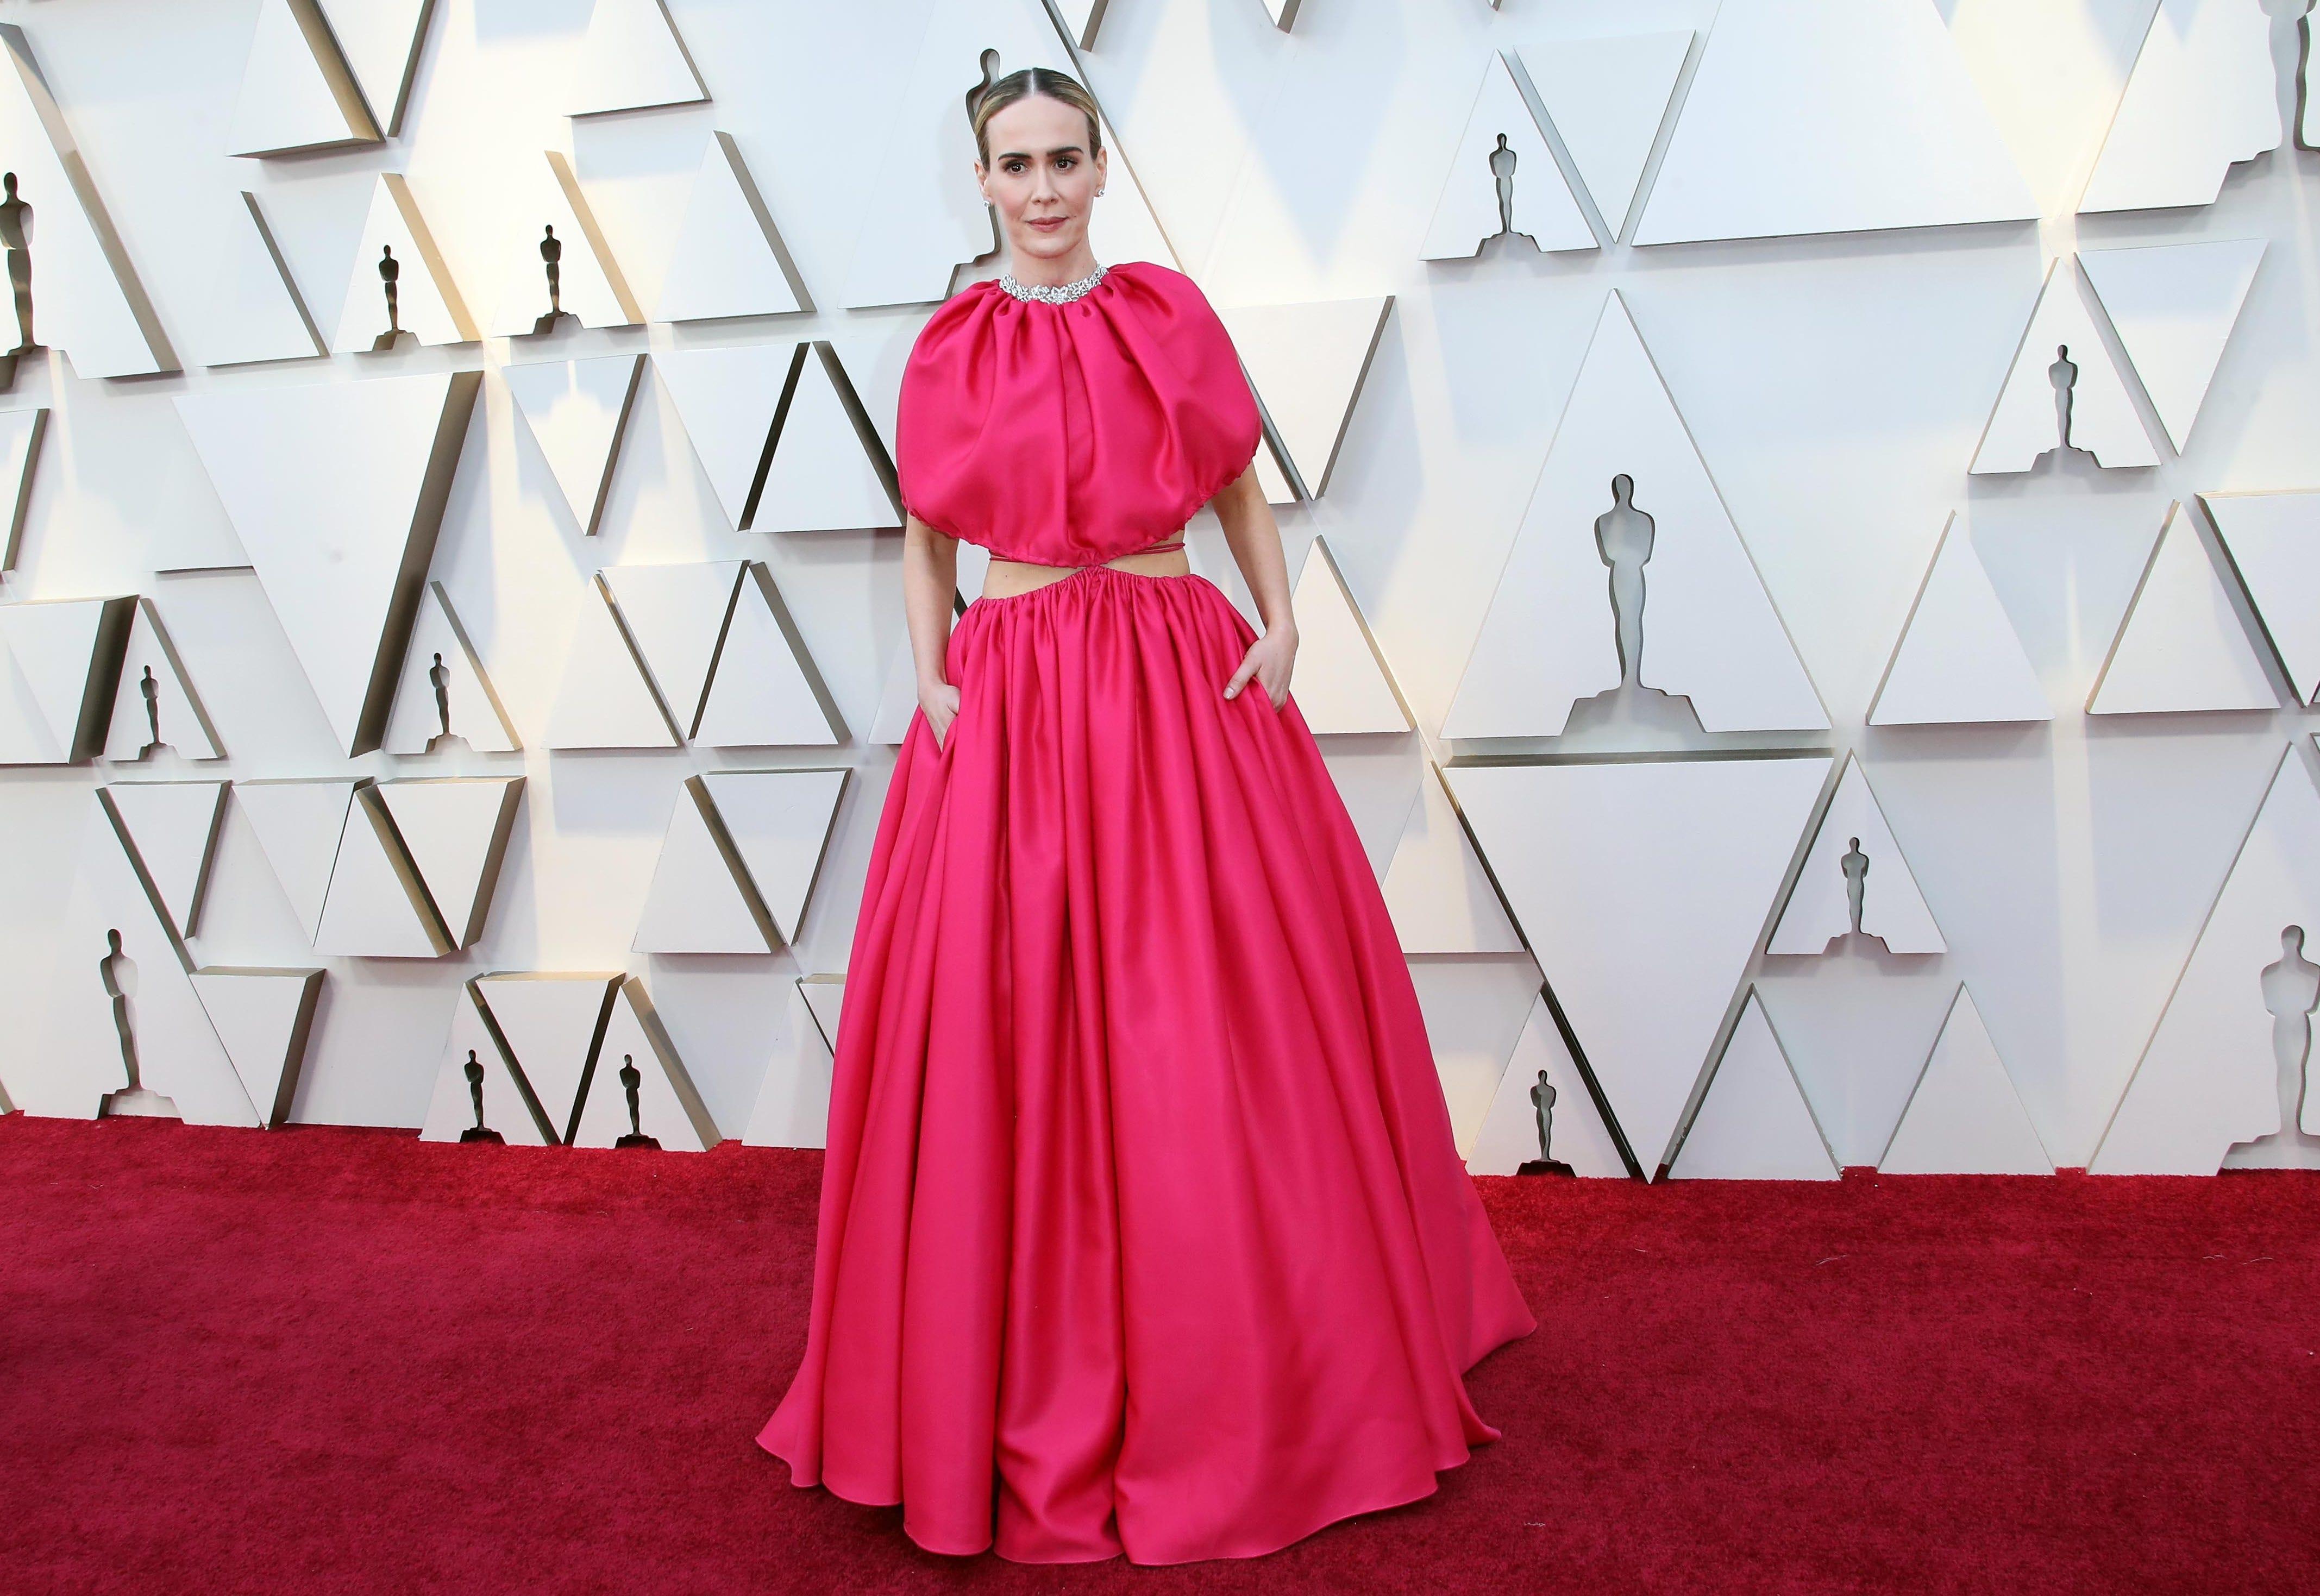 February 24, 2019; Los Angeles, CA, USA; Sarah Paulson arrives at the 91st Academy Awards at the Dolby Theatre. Mandatory Credit: Dan MacMedan-USA TODAY NETWORK